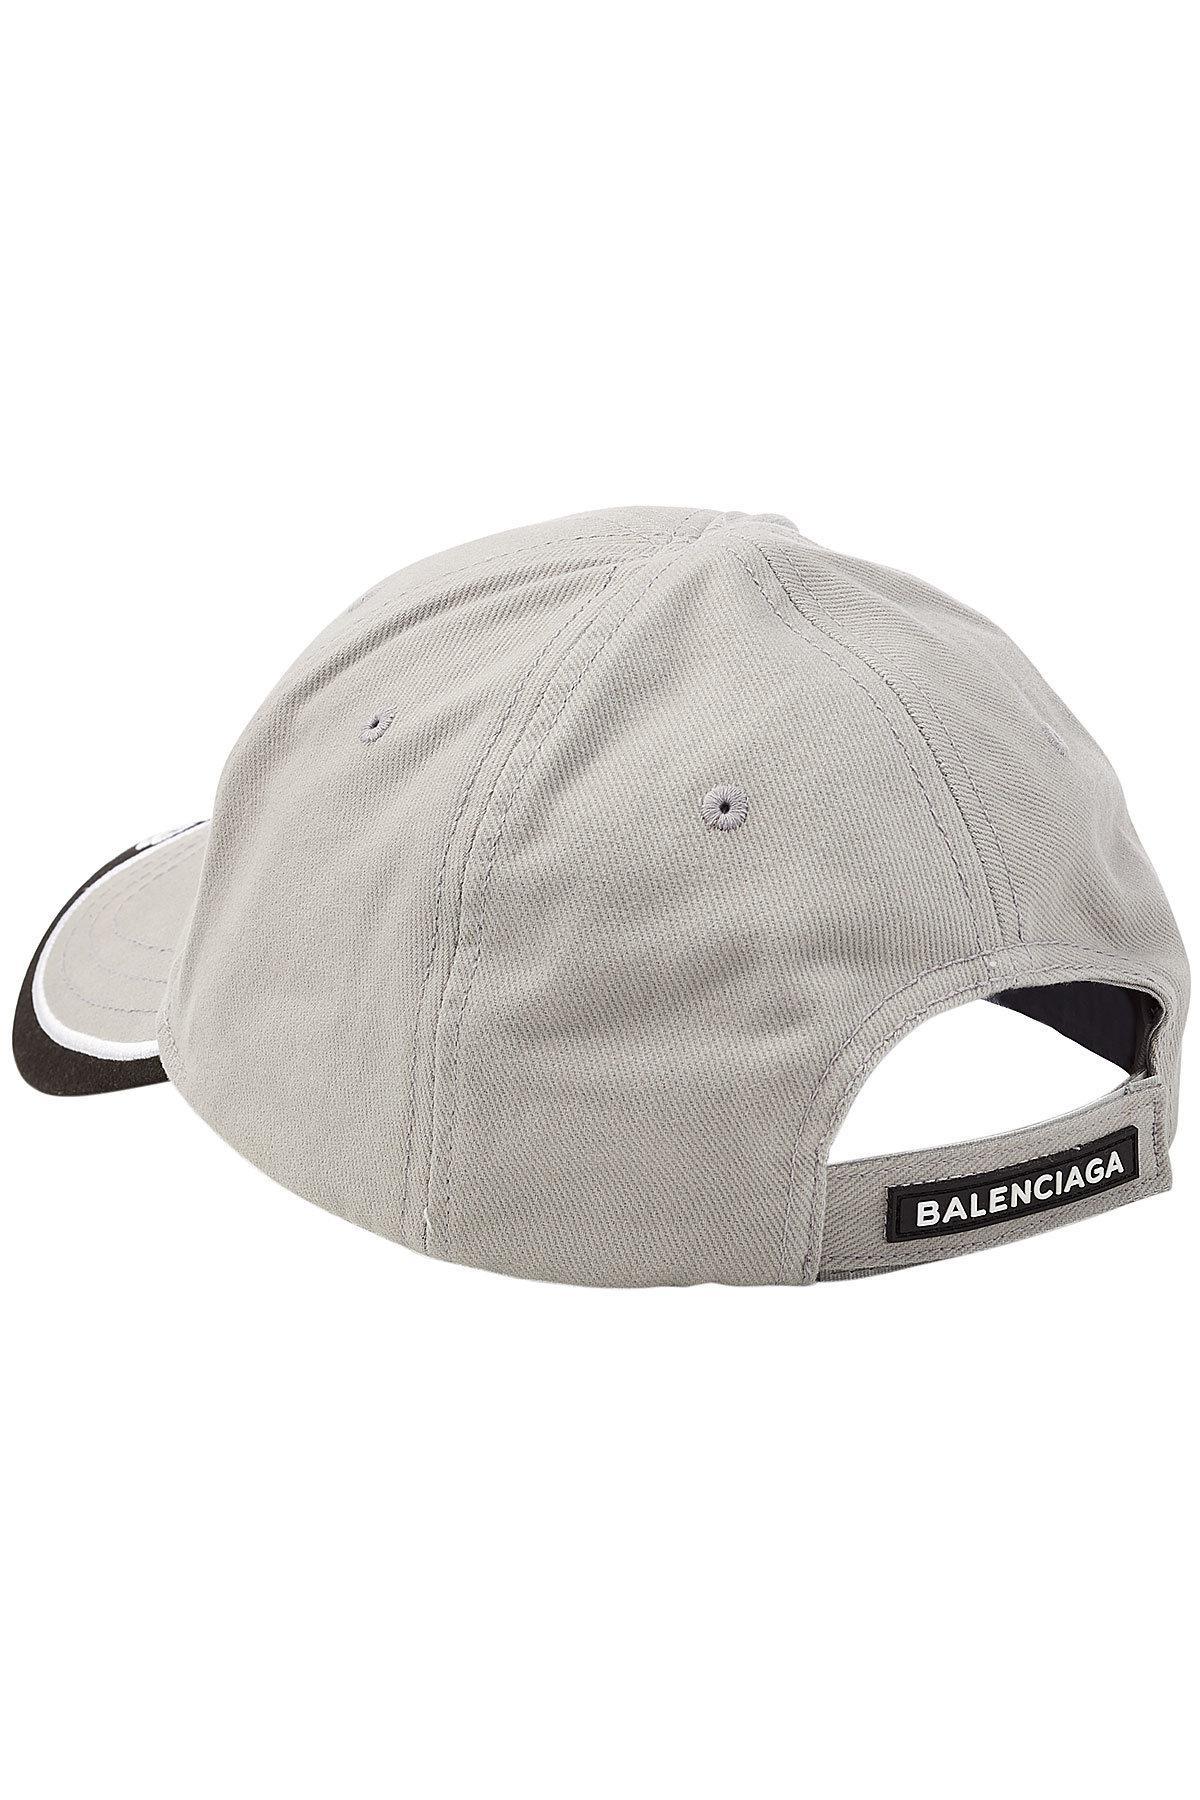 Lyst - Balenciaga Pe Logo Baseball Cap in Gray for Men d8b58bc3384